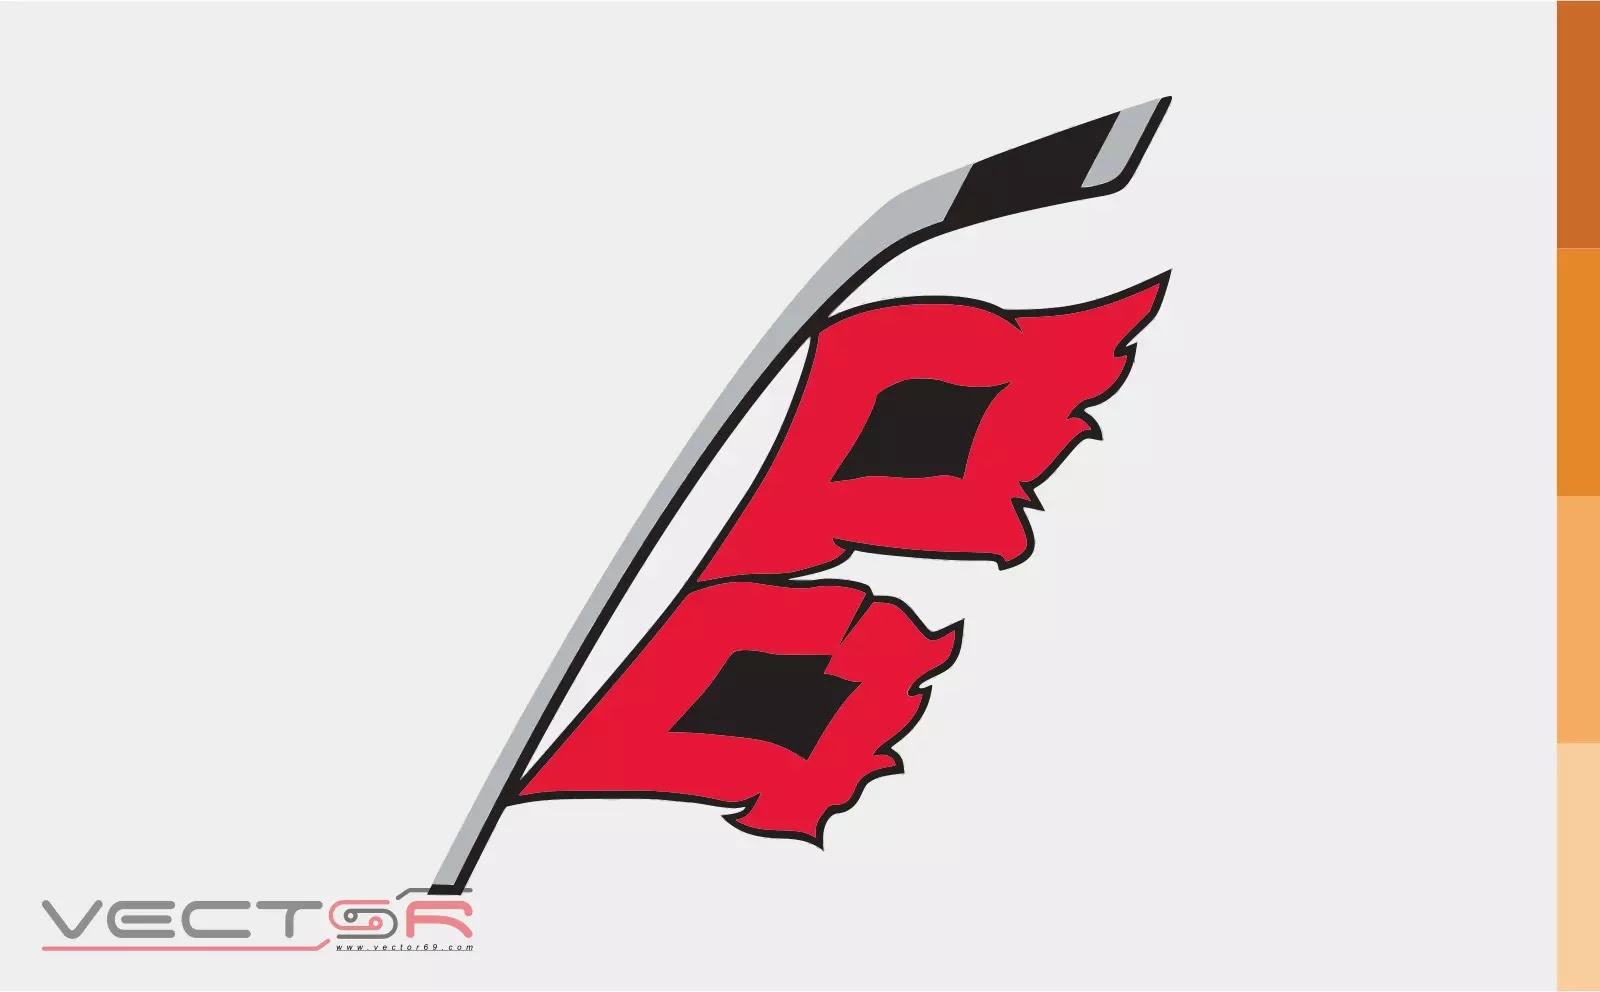 Carolina Hurricanes (2018) Secondary Logo - Download Vector File AI (Adobe Illustrator)